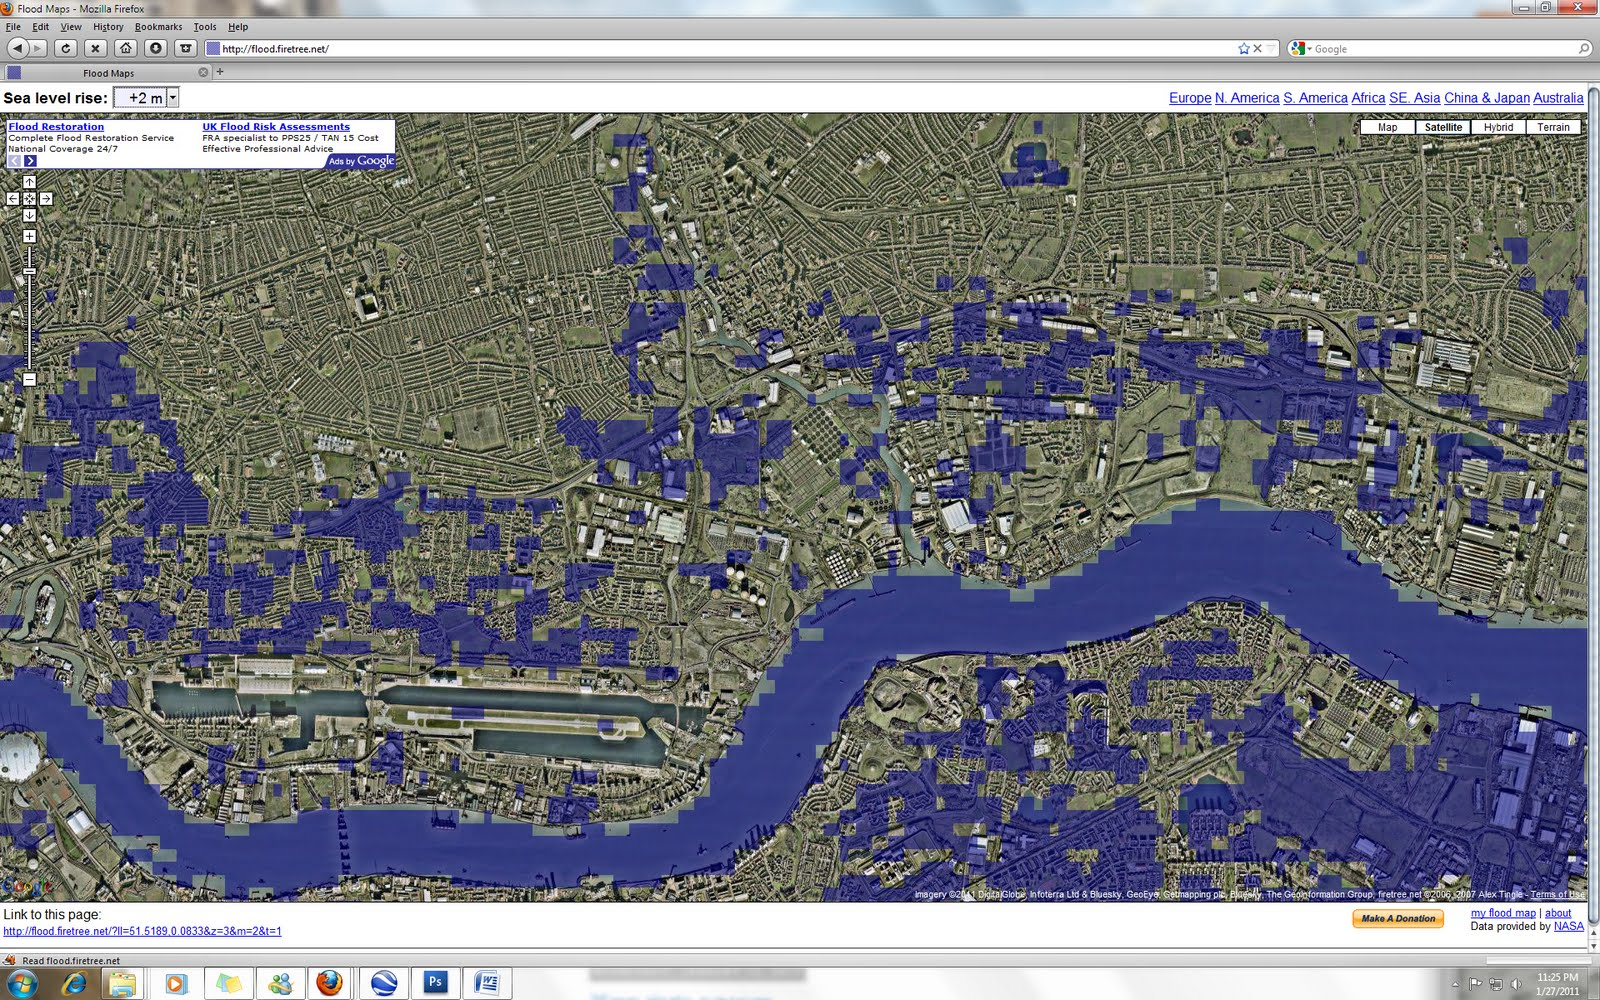 flood map east london 1 2m